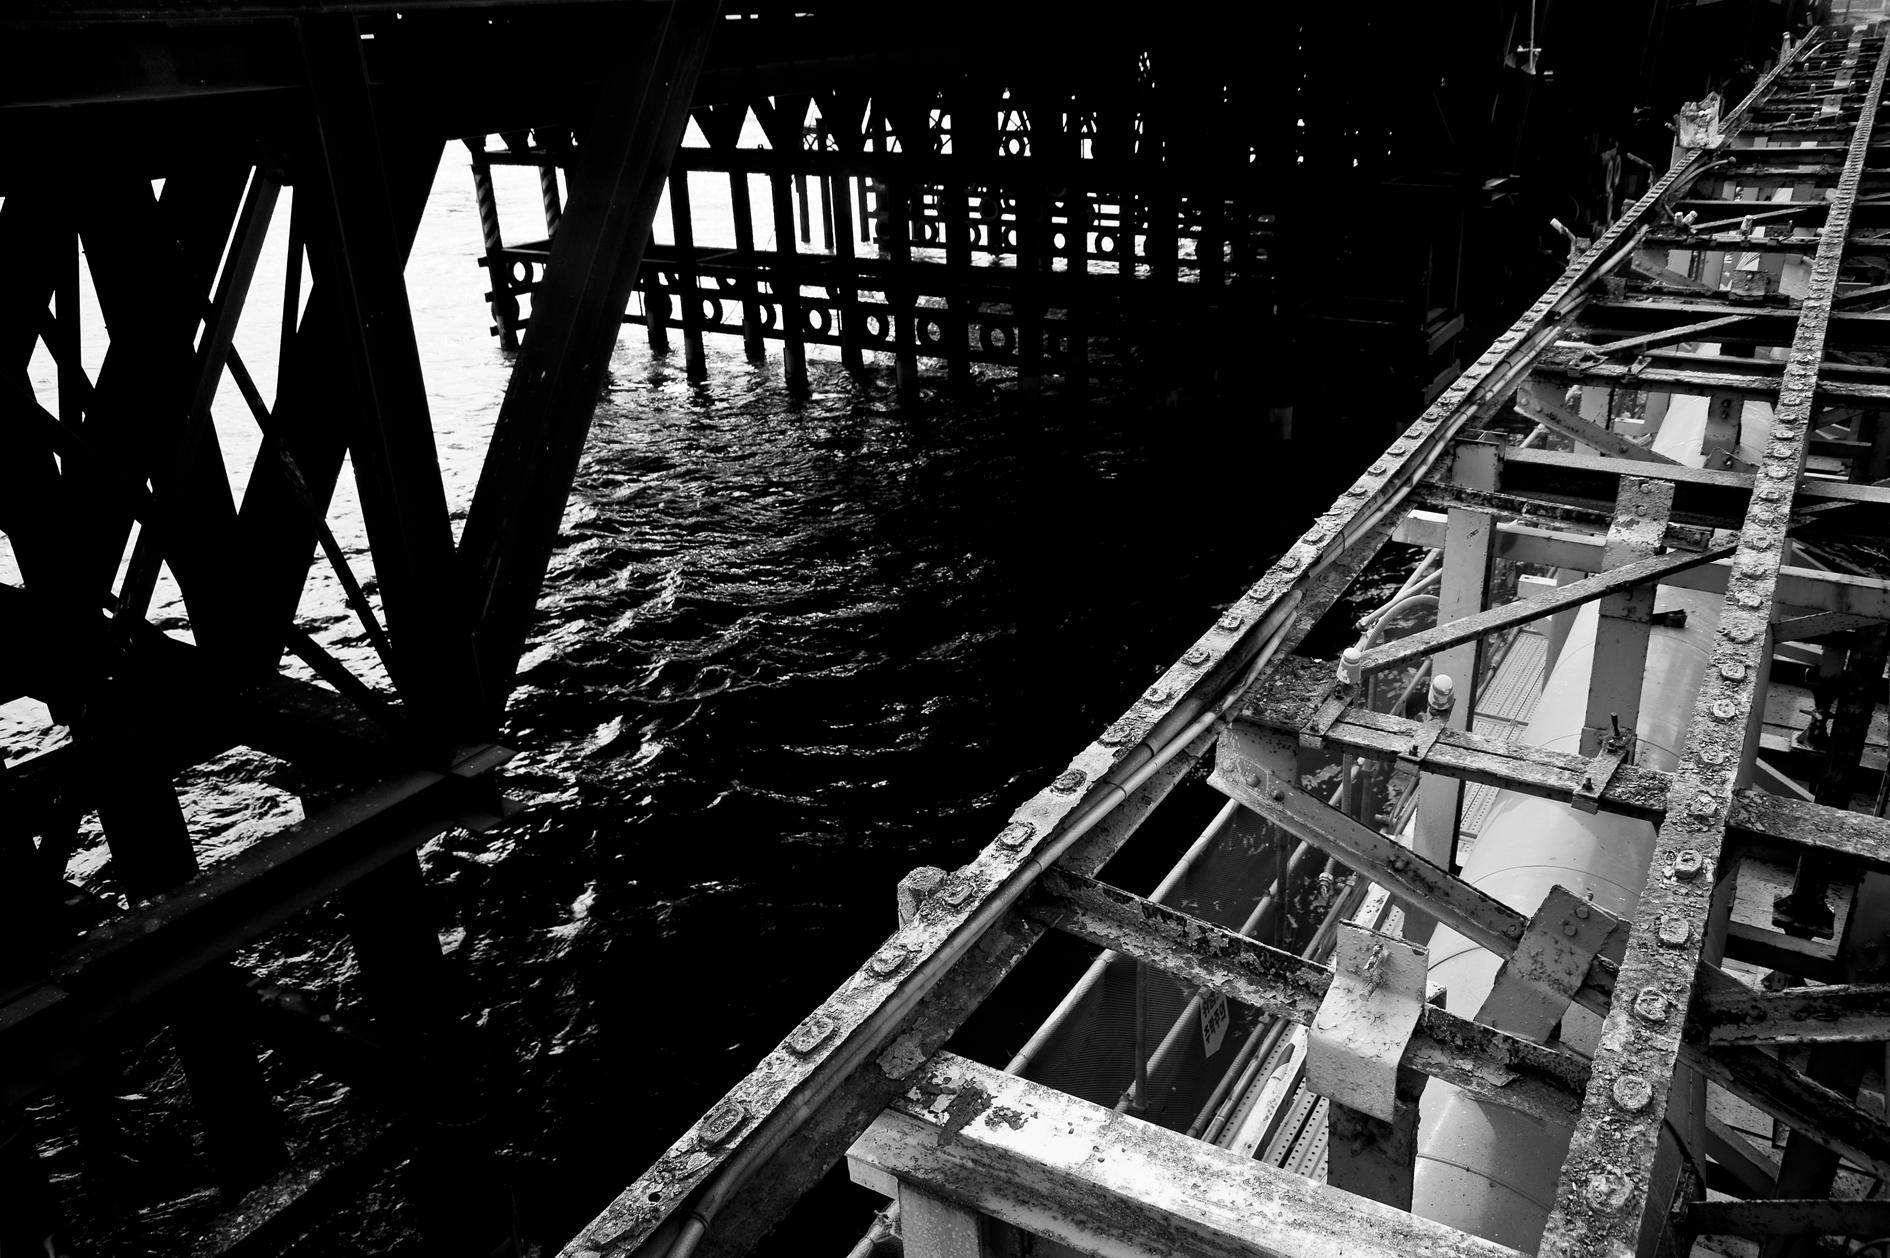 gray-부산 영도다리 2011 #09.jpg